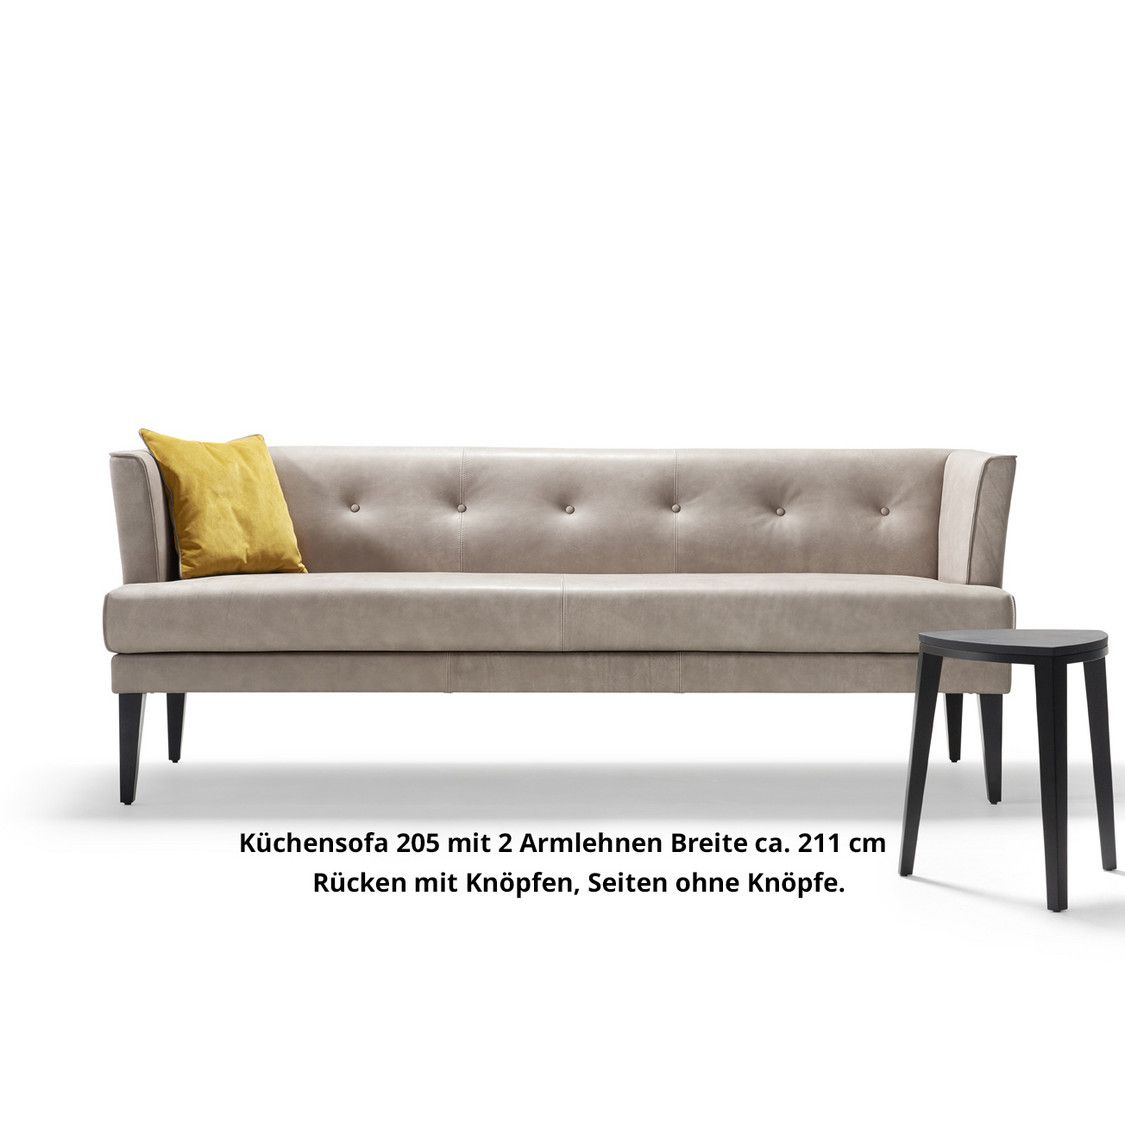 Kuchensofa Smilla Von Signet Hauptstadtmoebel De In 2020 Kuchen Sofa Kuchensofa Sofa